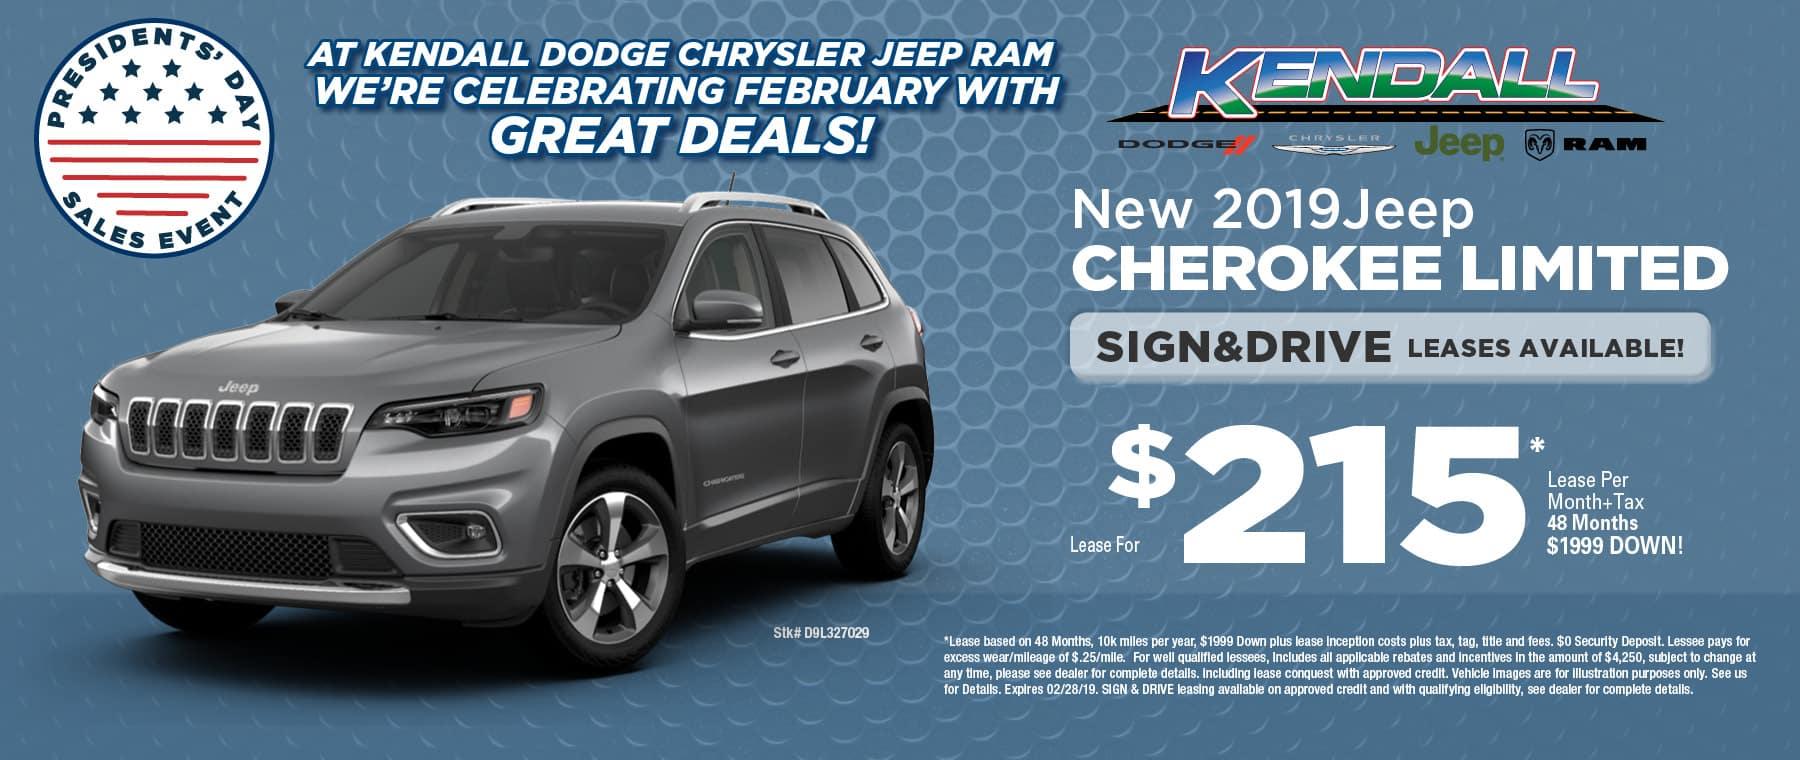 Kendall Dodge Chrysler Jeep Ram Chrysler Dodge Jeep Ram Dealer